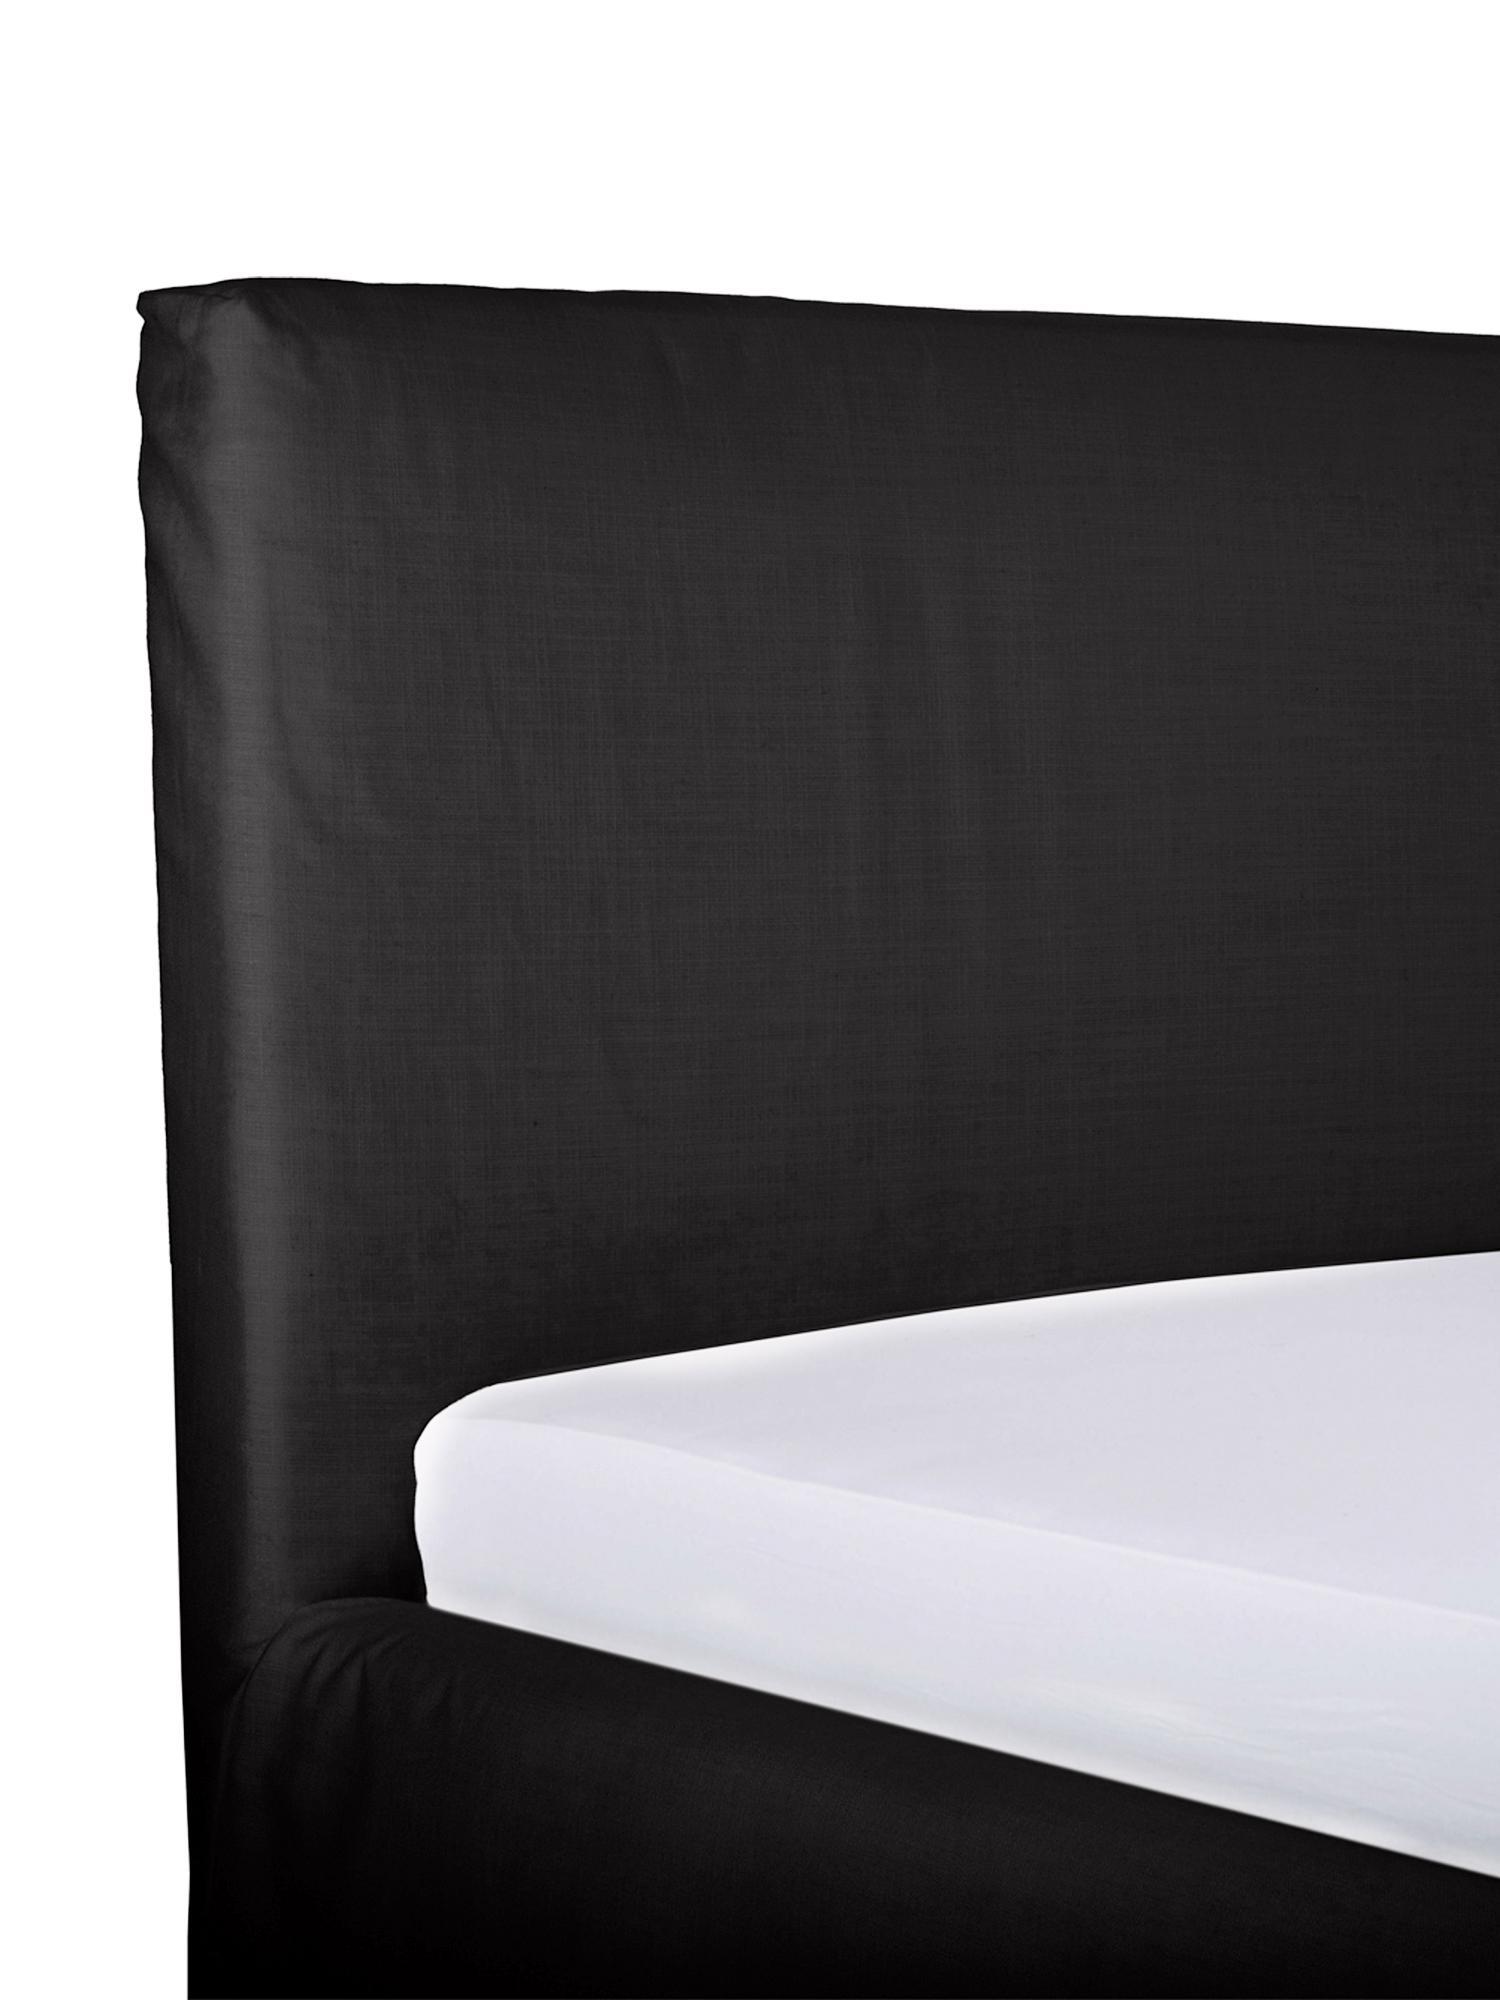 Polsterbett Feather mit Stauraum, Korpus: Massives Kiefernholz, Bezug: Polyester (Strukturstoff), Webstoff Anthrazit, 180 x 200 cm